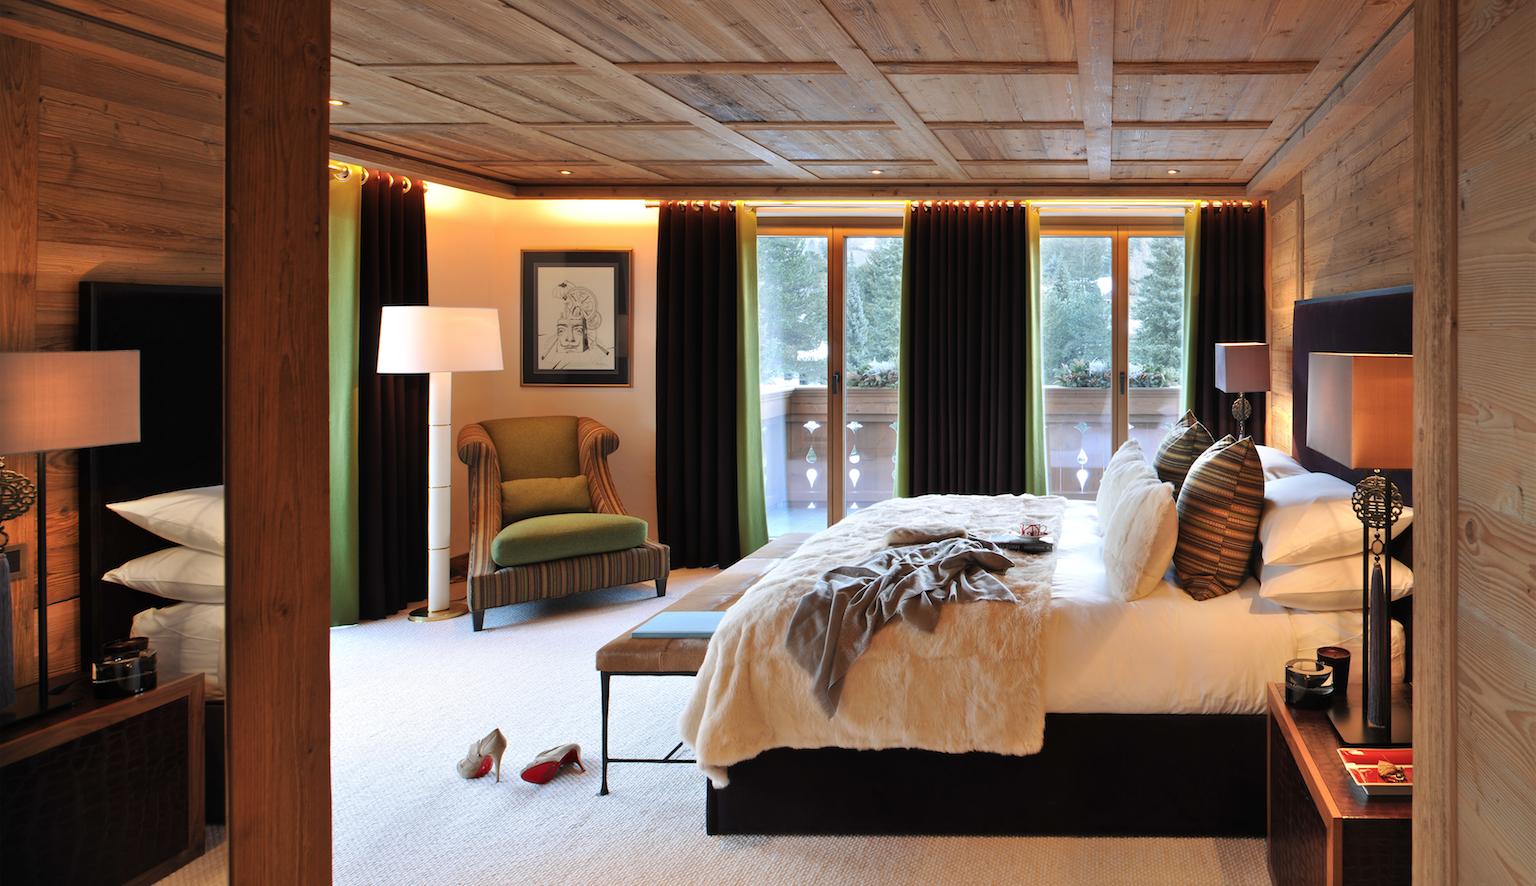 Interior design byNicky Dobree